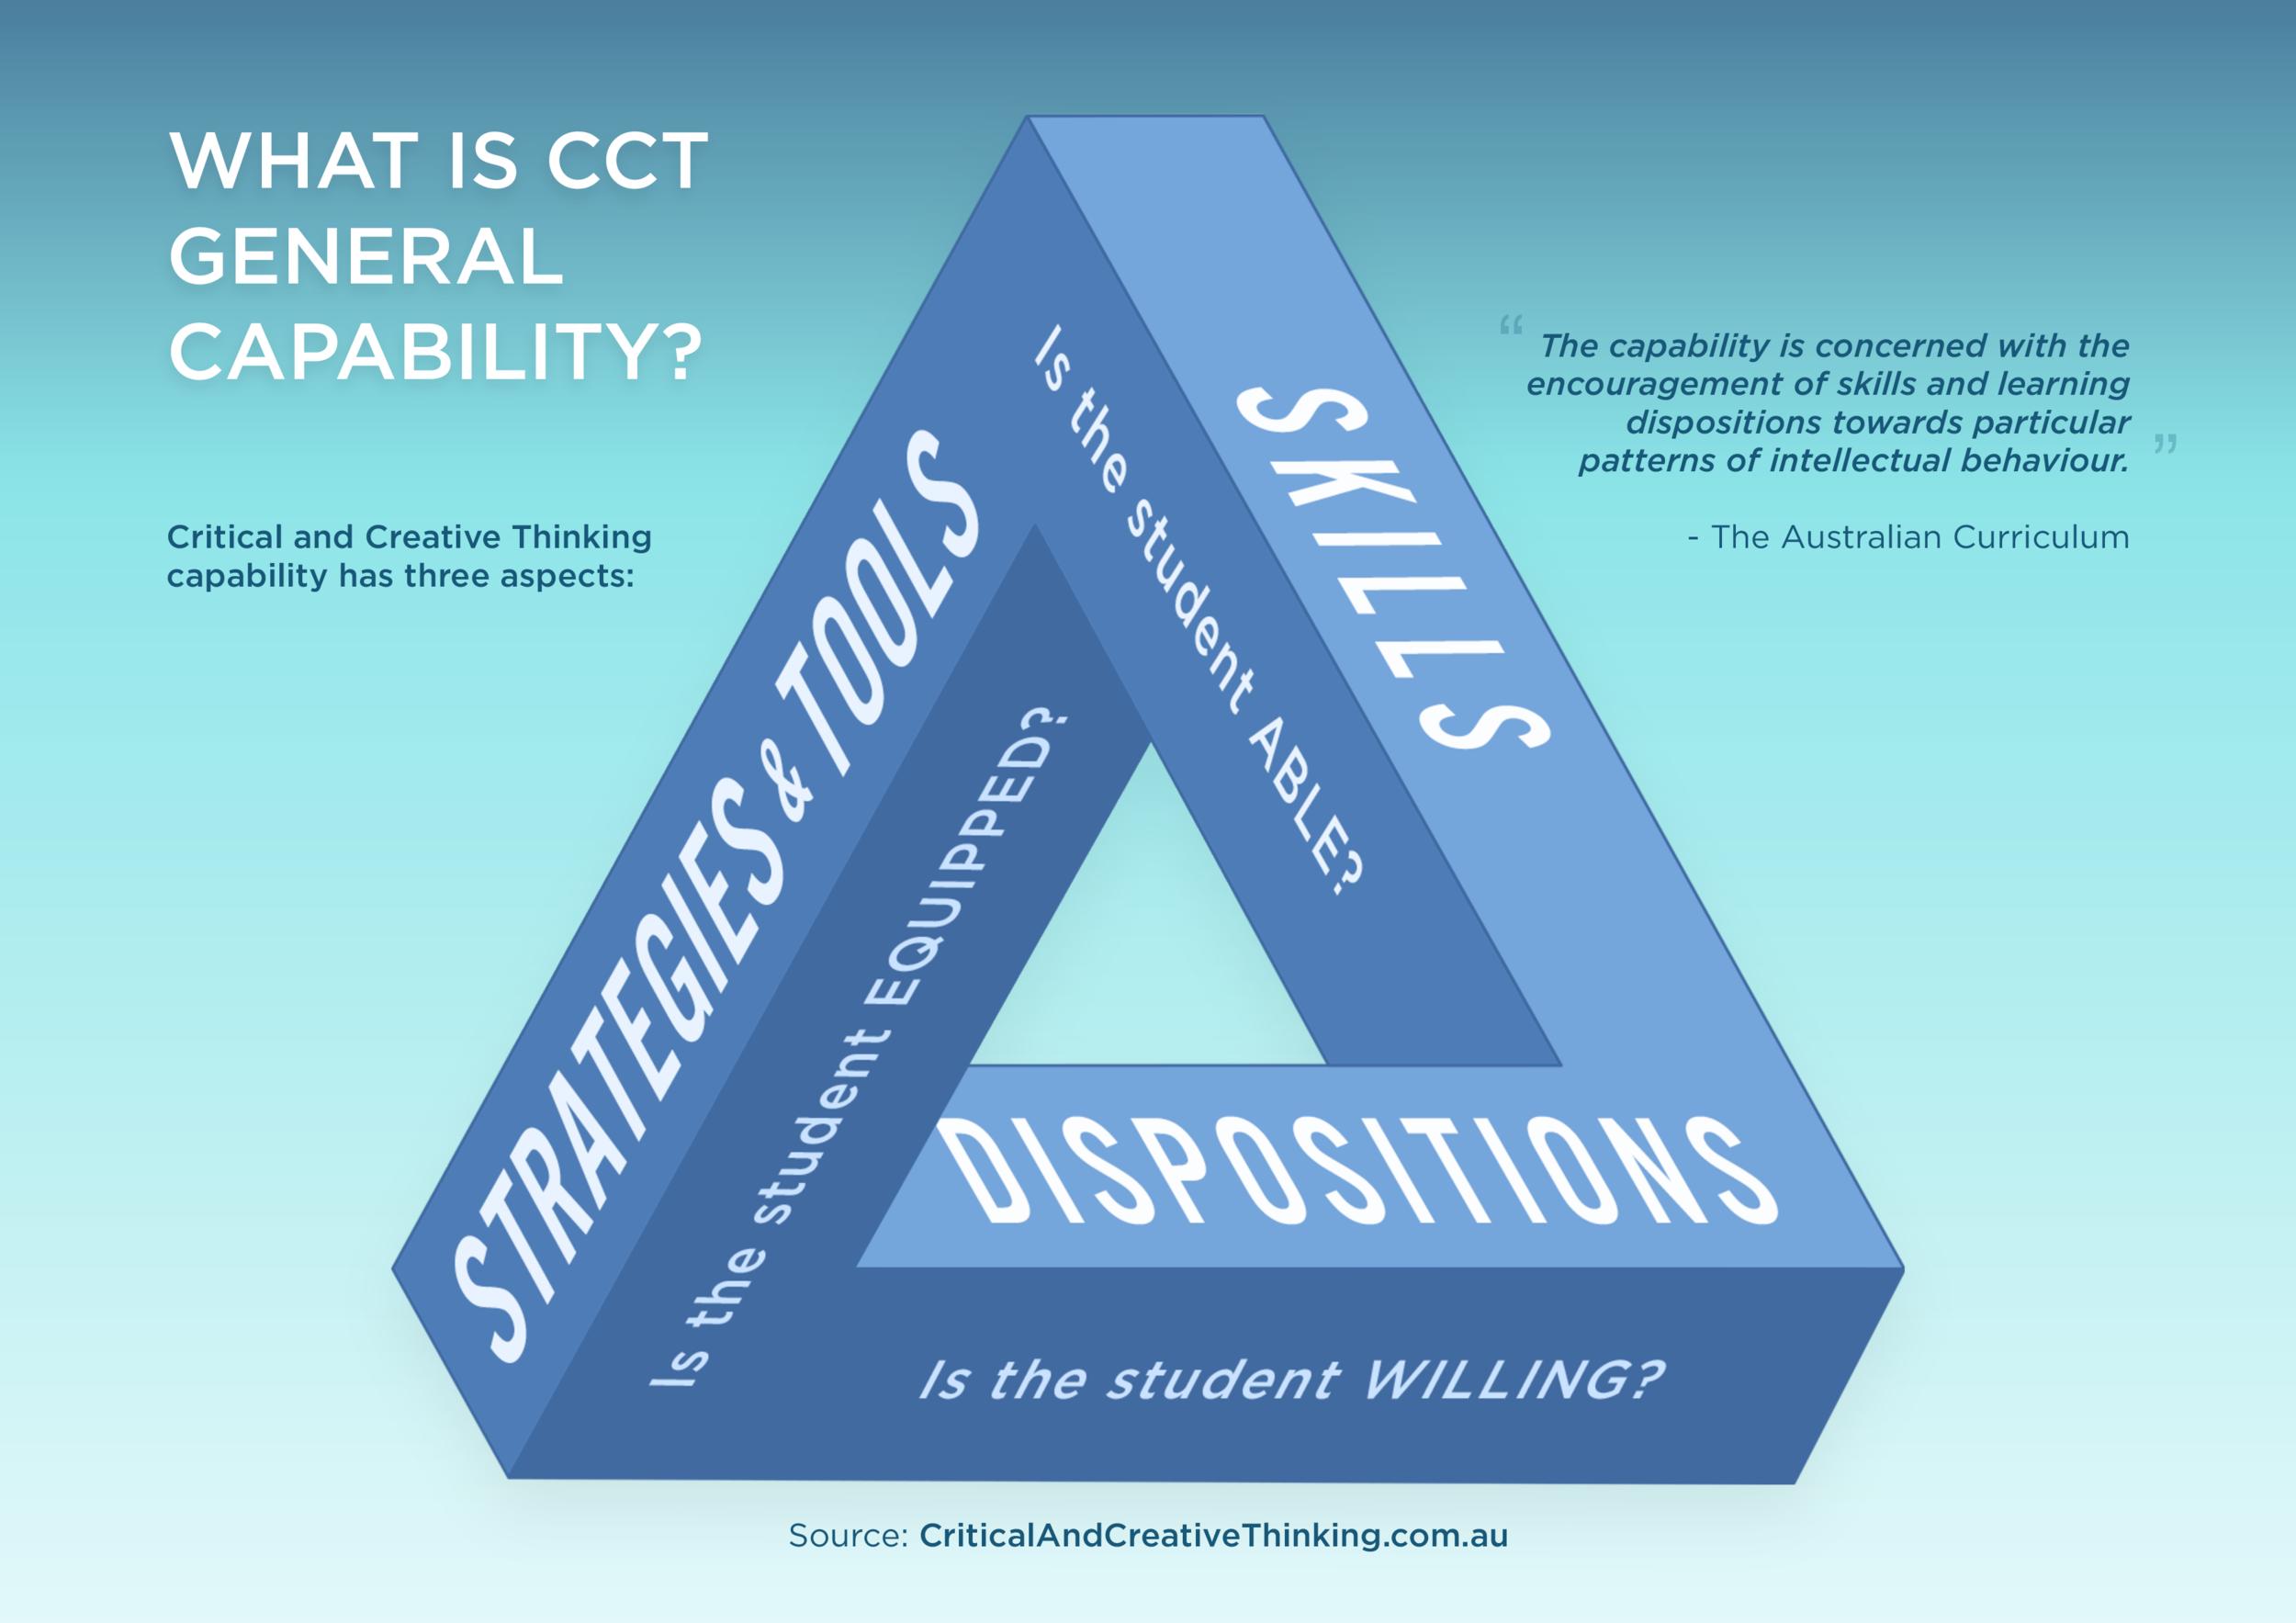 CCT capability Australian Curriculum